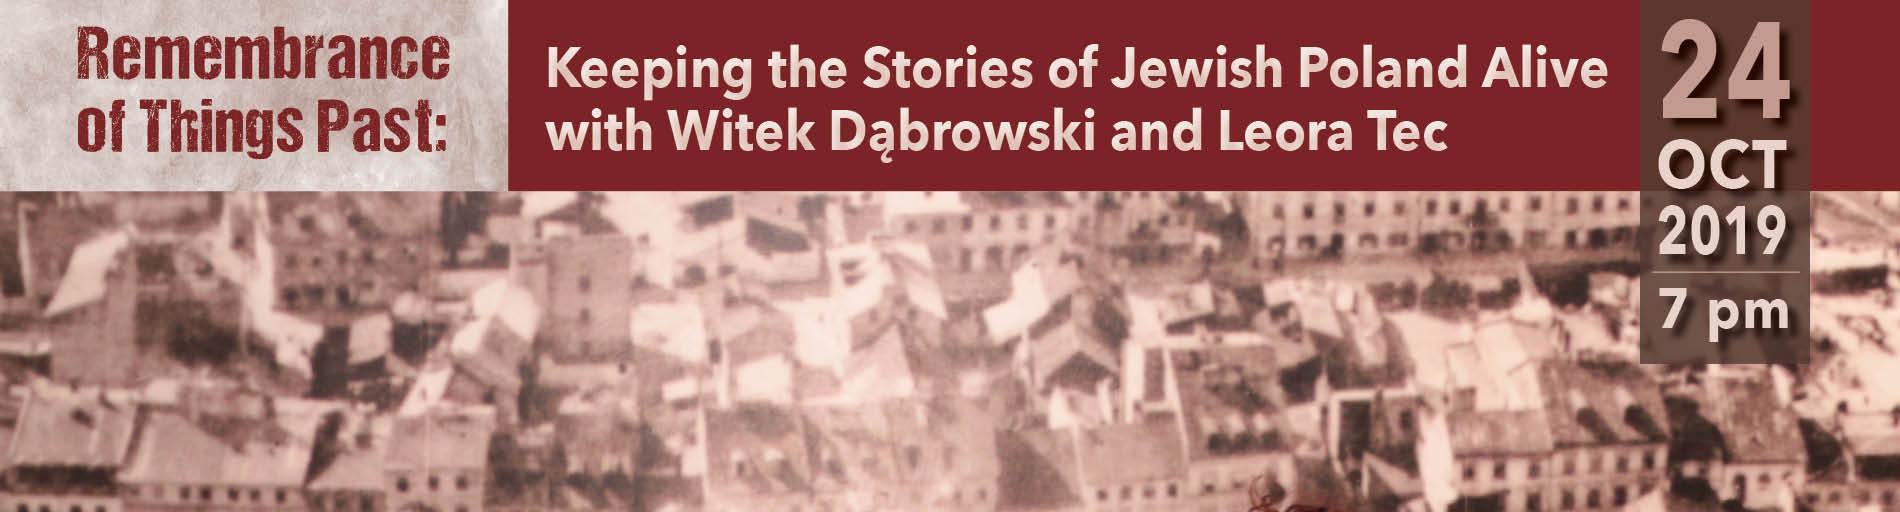 Remembering Jewish Poland